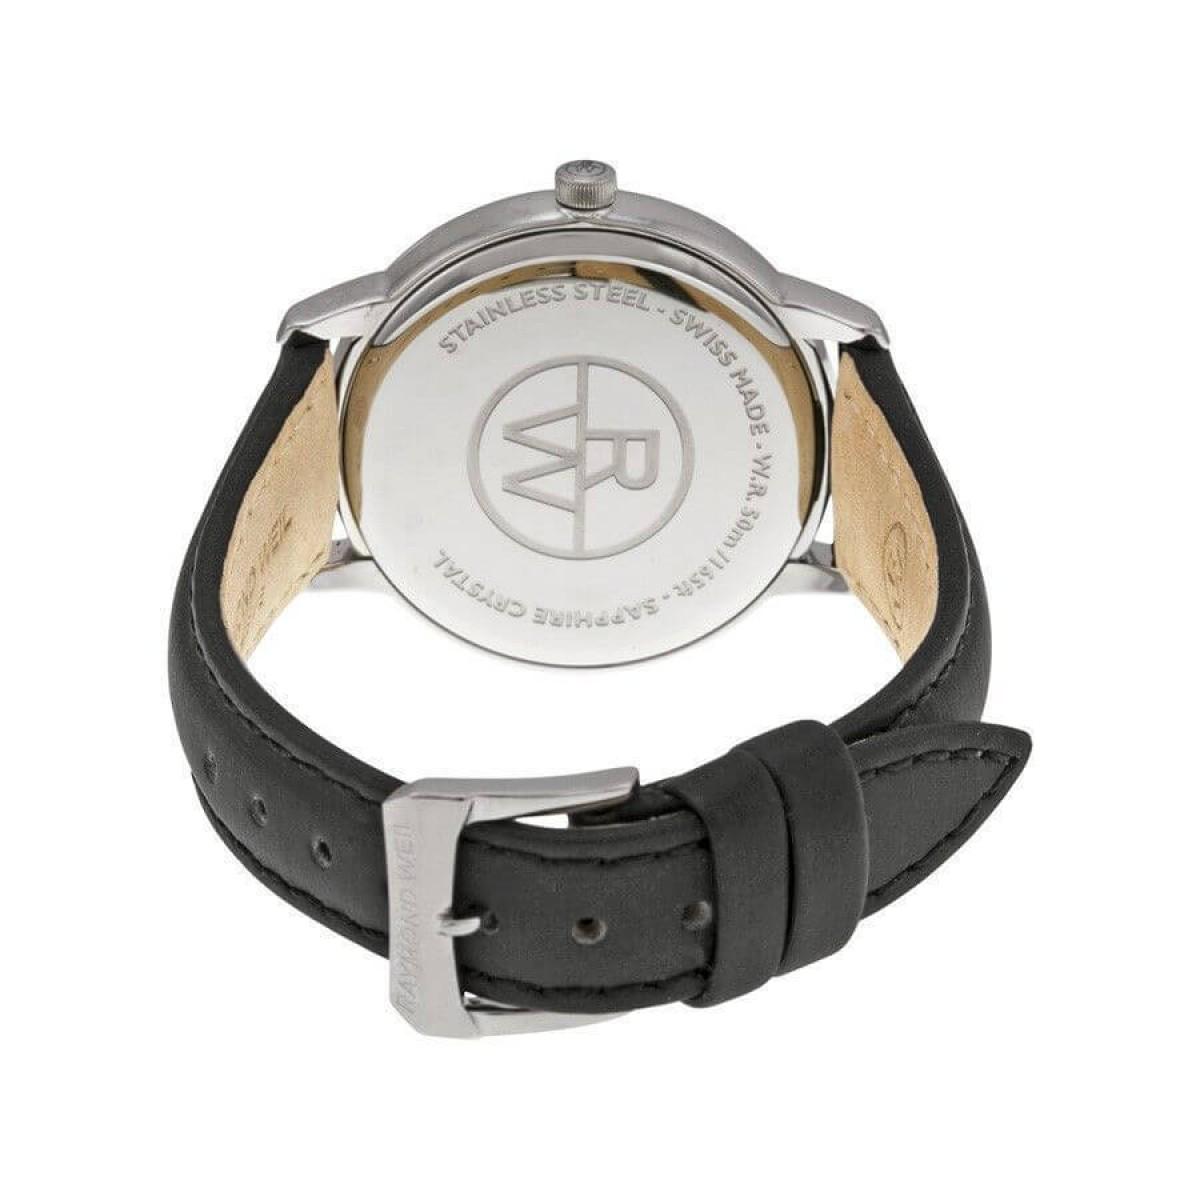 Часовник Raymond Weil 5388-SLS-20081